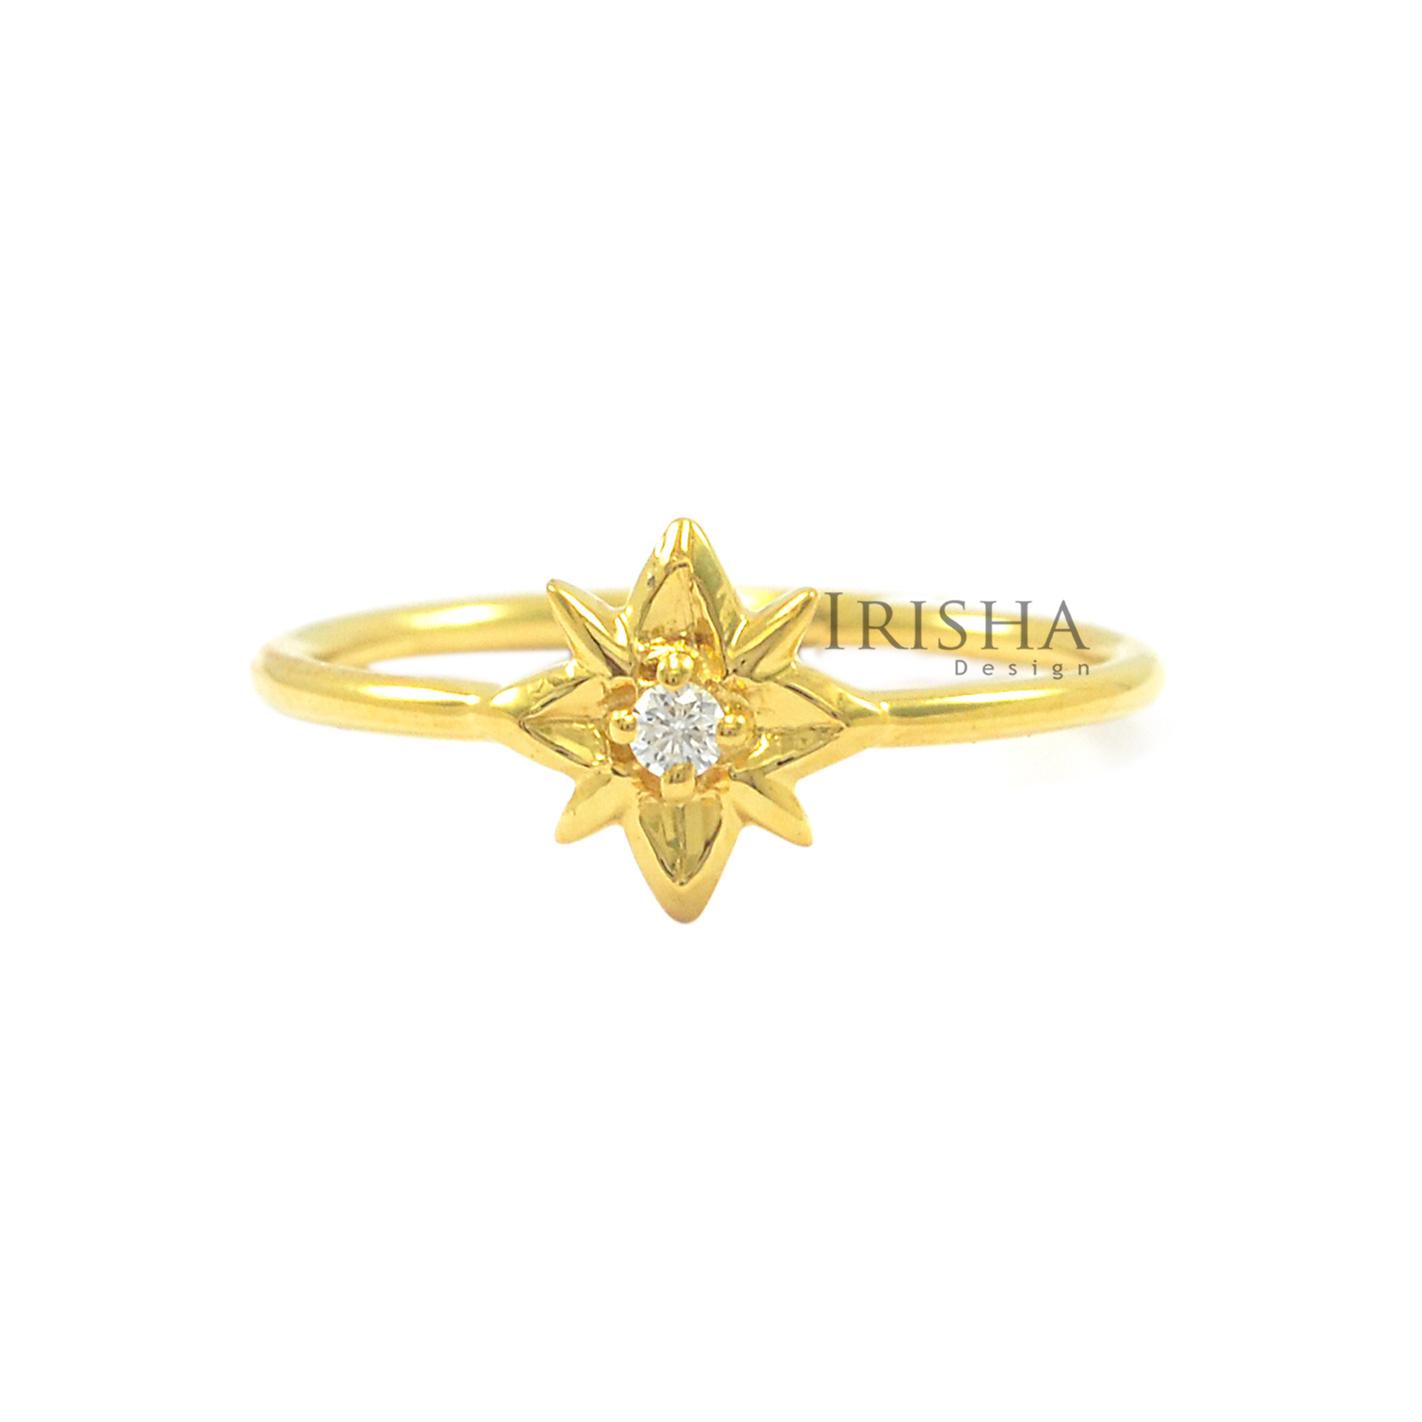 14K Gold 0.02 Ct. Solitaire Genuine Diamond Starburst Fine Ring Size - 3 to 9 US